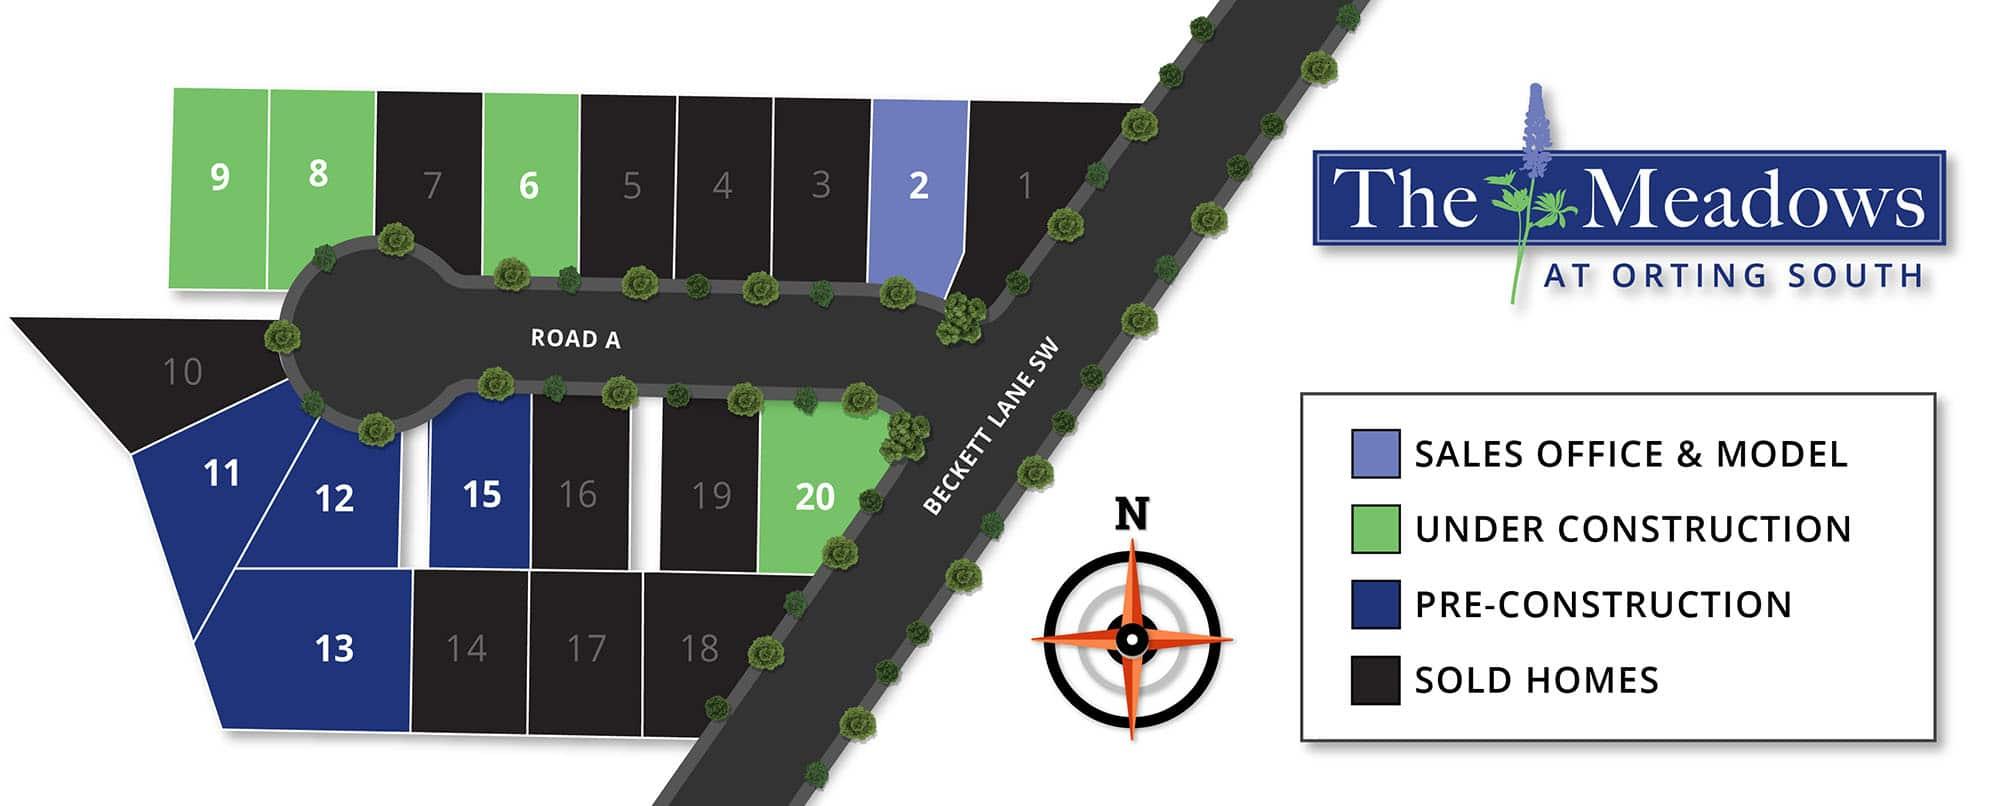 Meadows-South-Site-Map-WEB